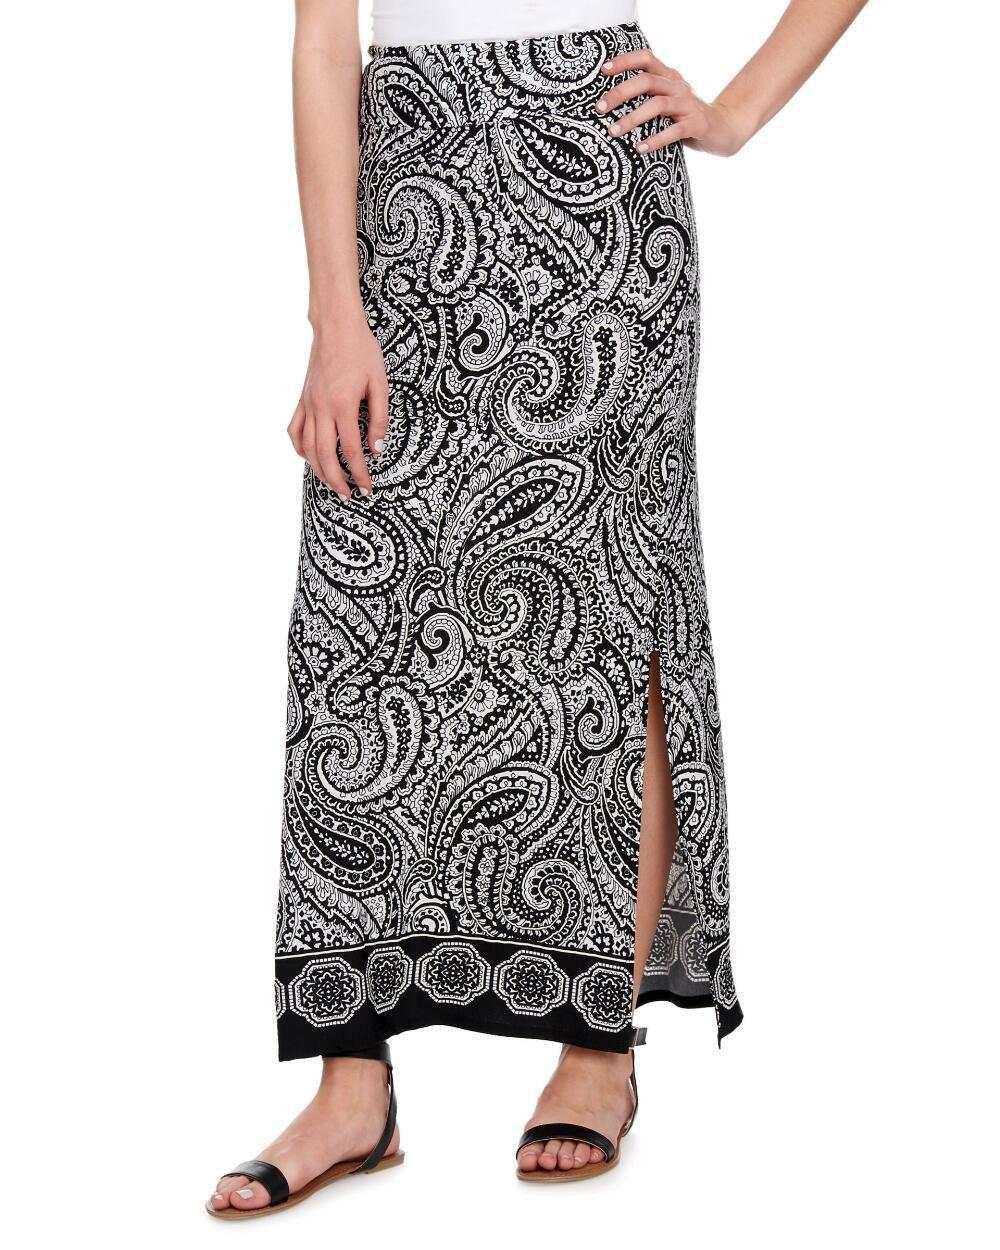 Puffed Paisley Border Print Maxi Skirt Clearance Stein Mart Printed Maxi Skirts Maxi Skirt Printed Maxi [ 1250 x 1000 Pixel ]